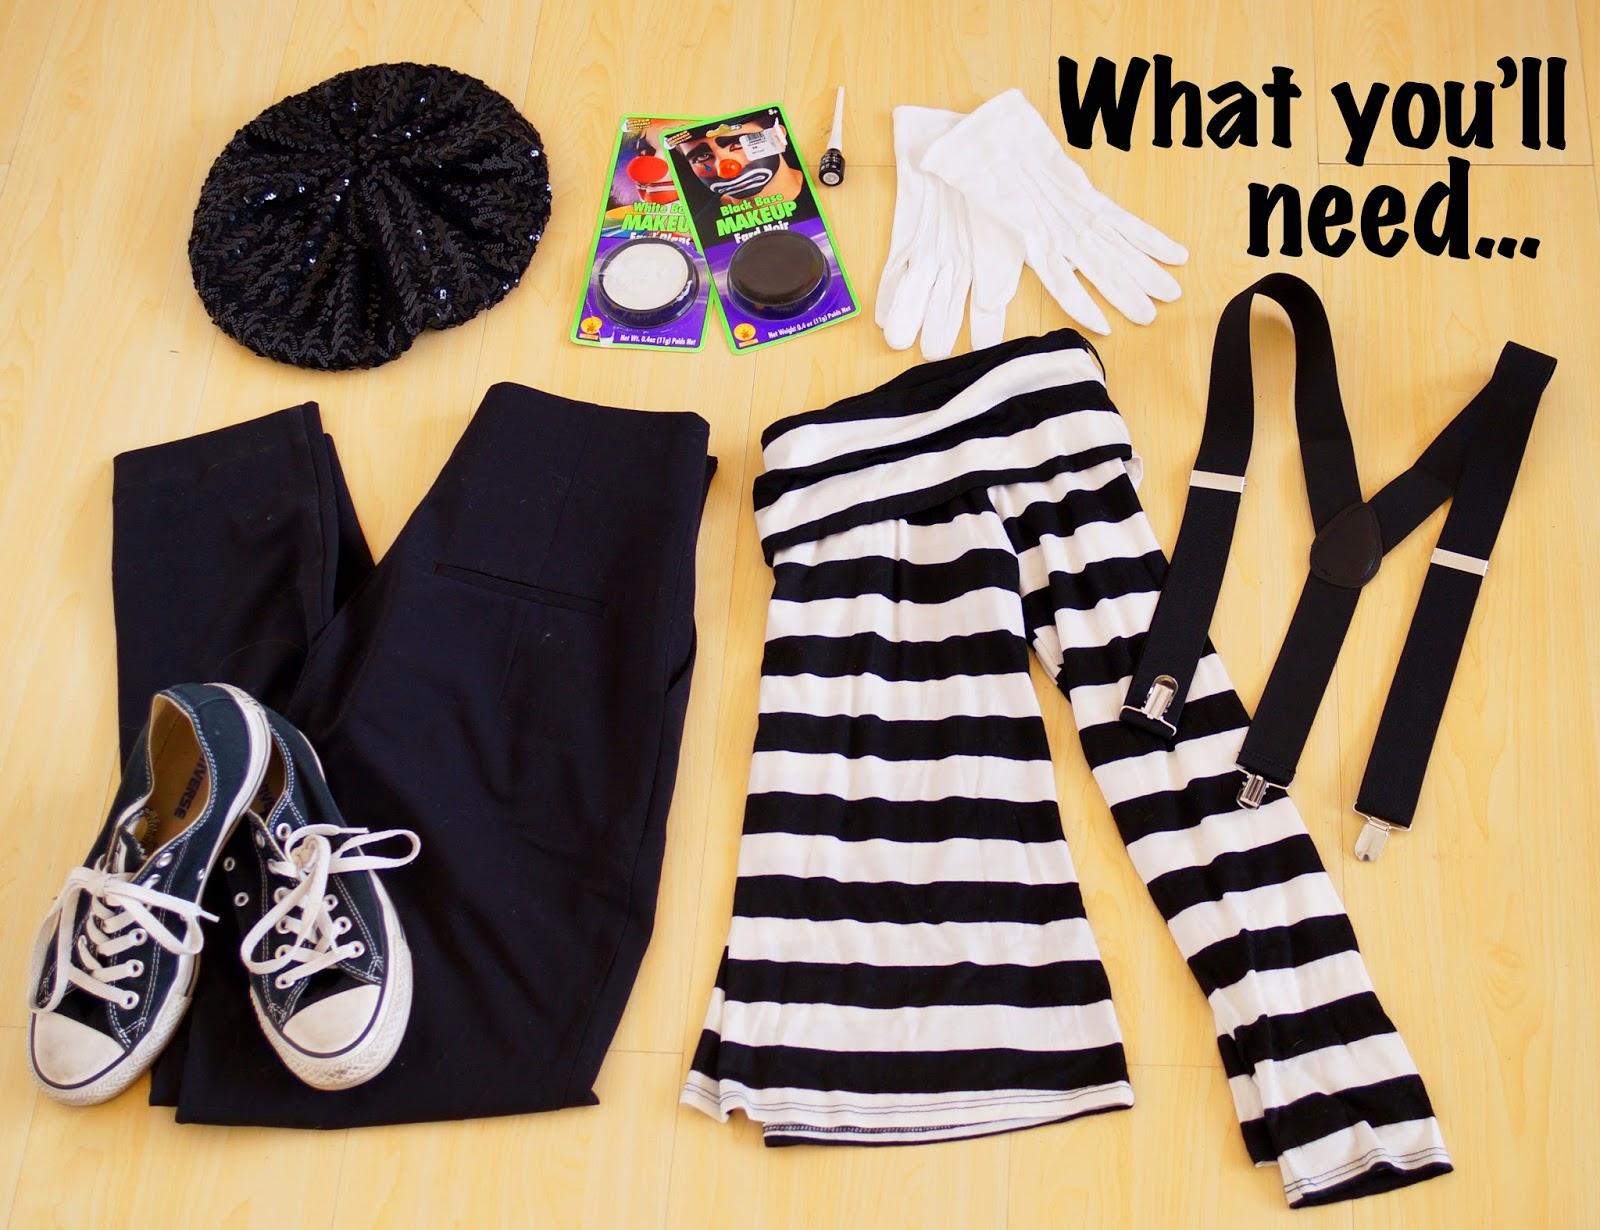 Homemade Costume Ideas & The Joy of Fashion: Halloween: Last Minute Homemade Mime Costume